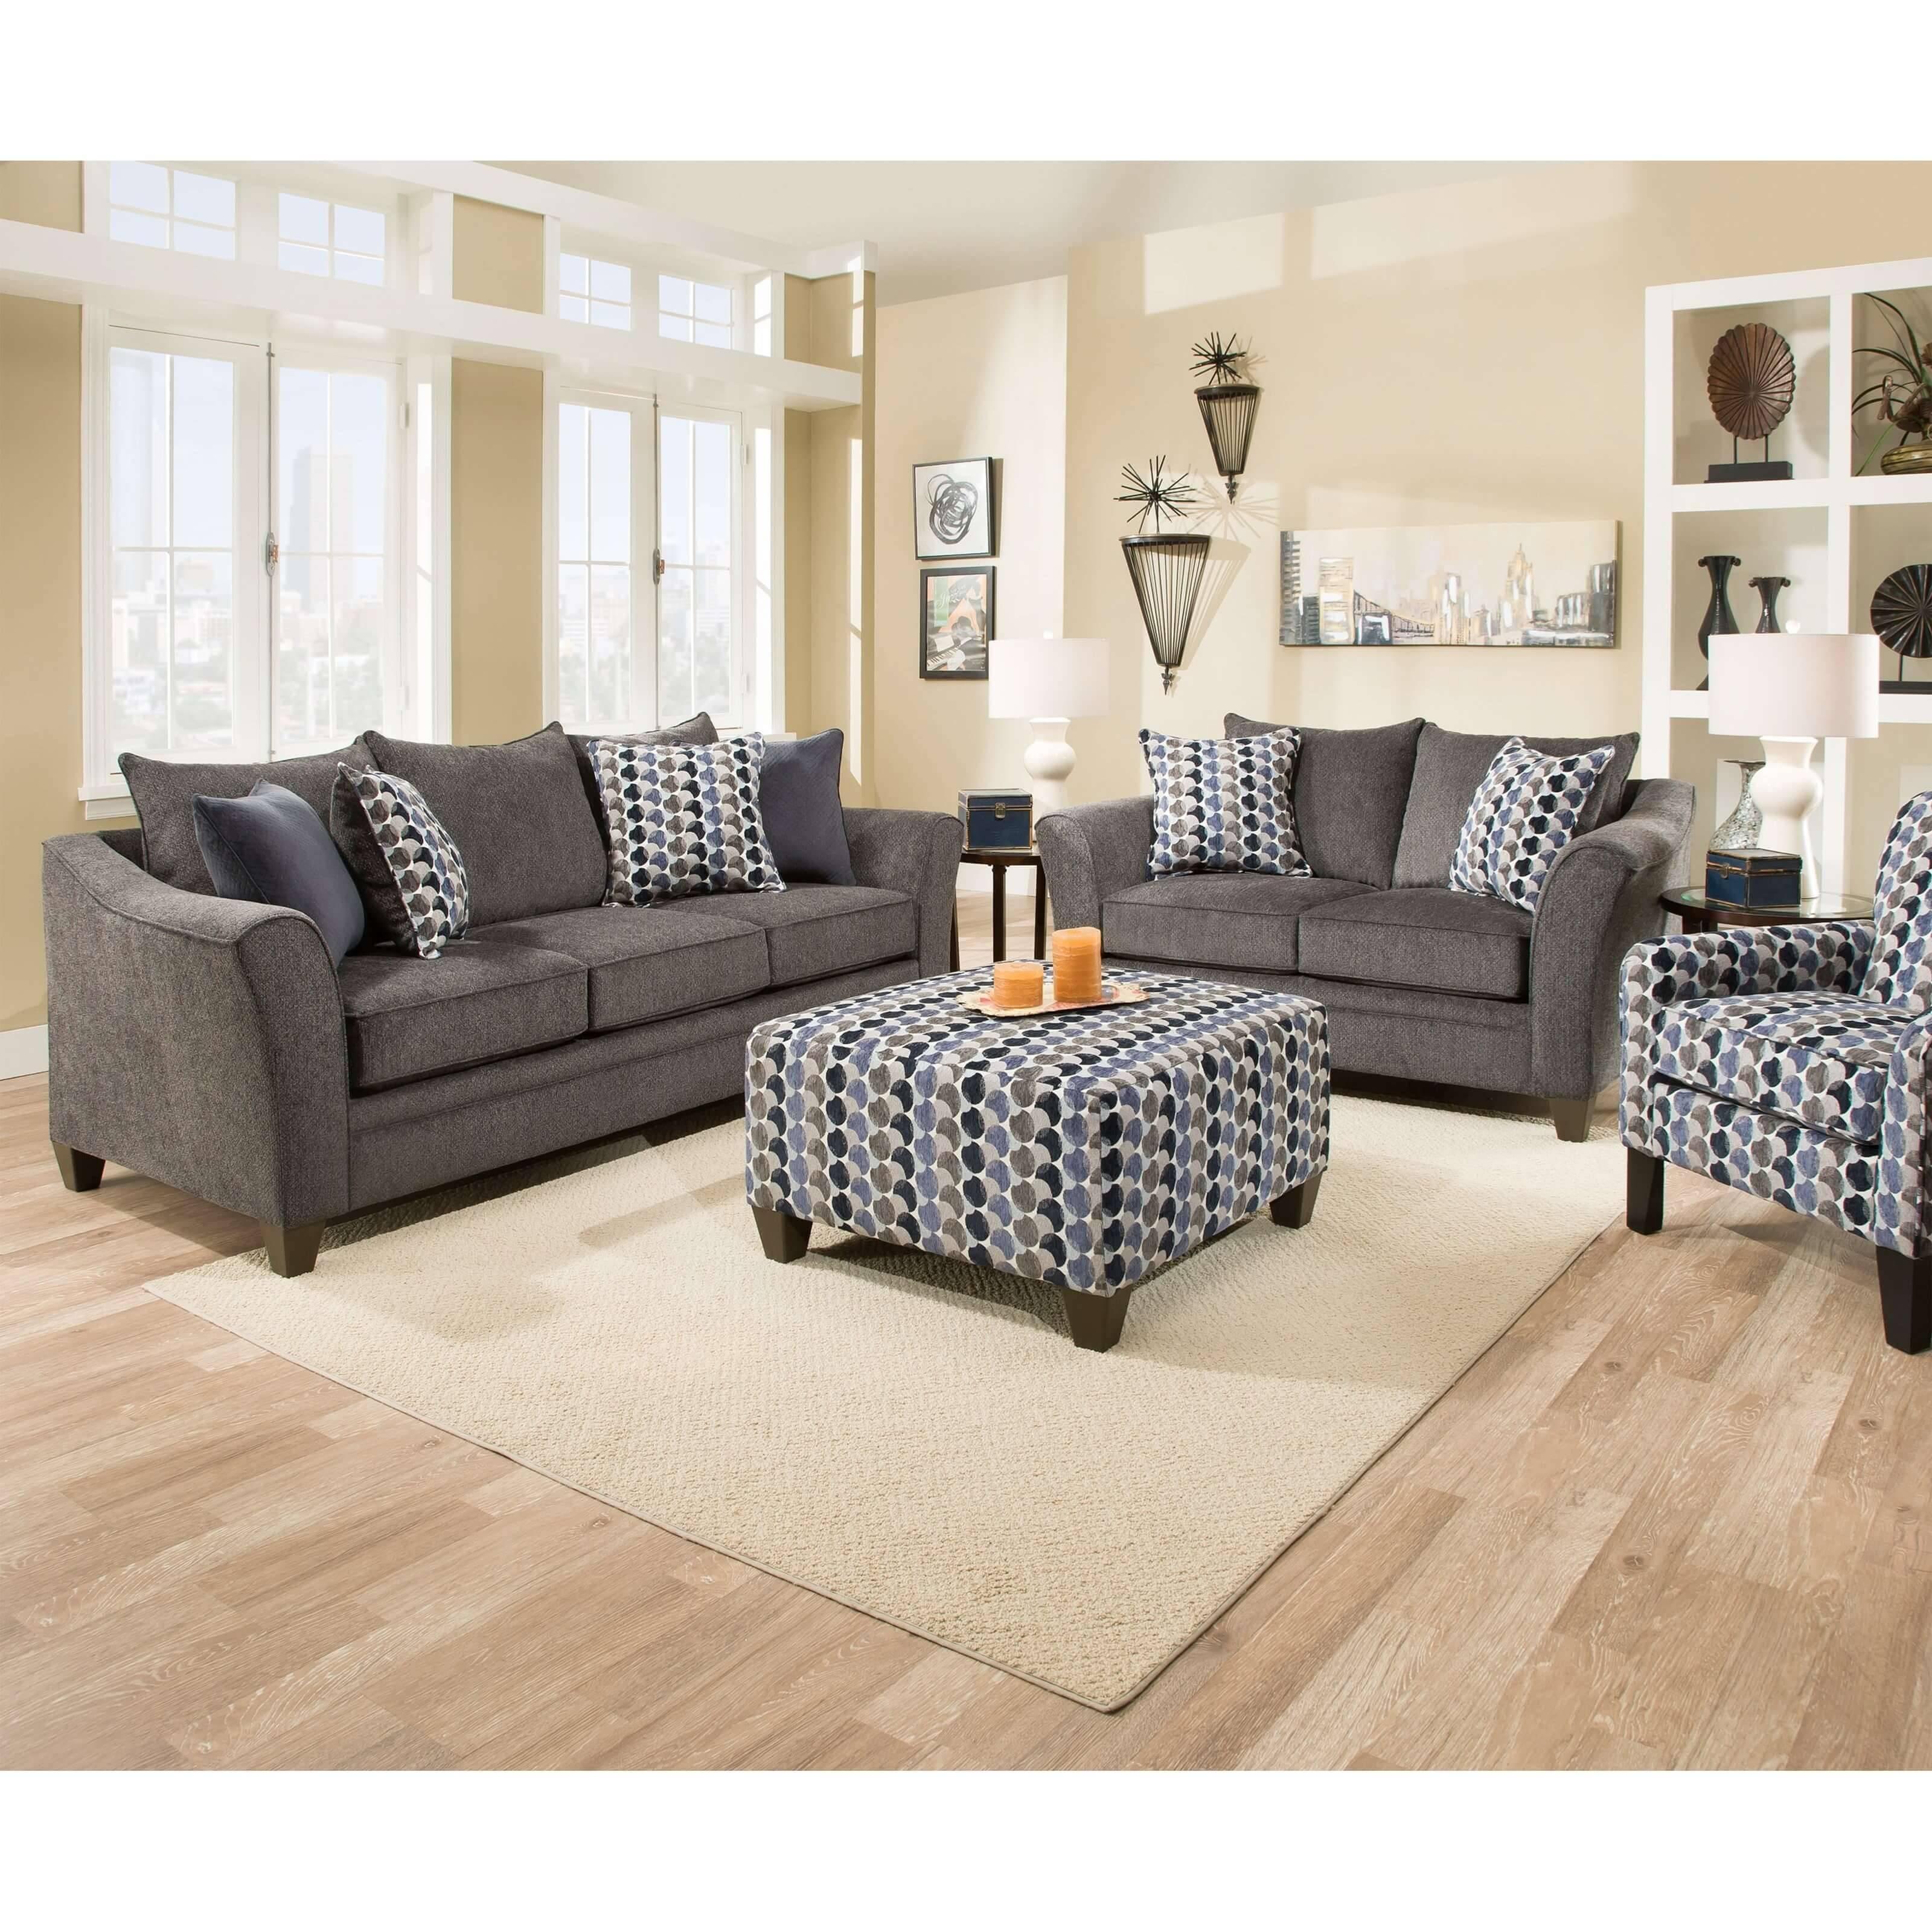 Top 15 Of Big Lots Simmons Furniture